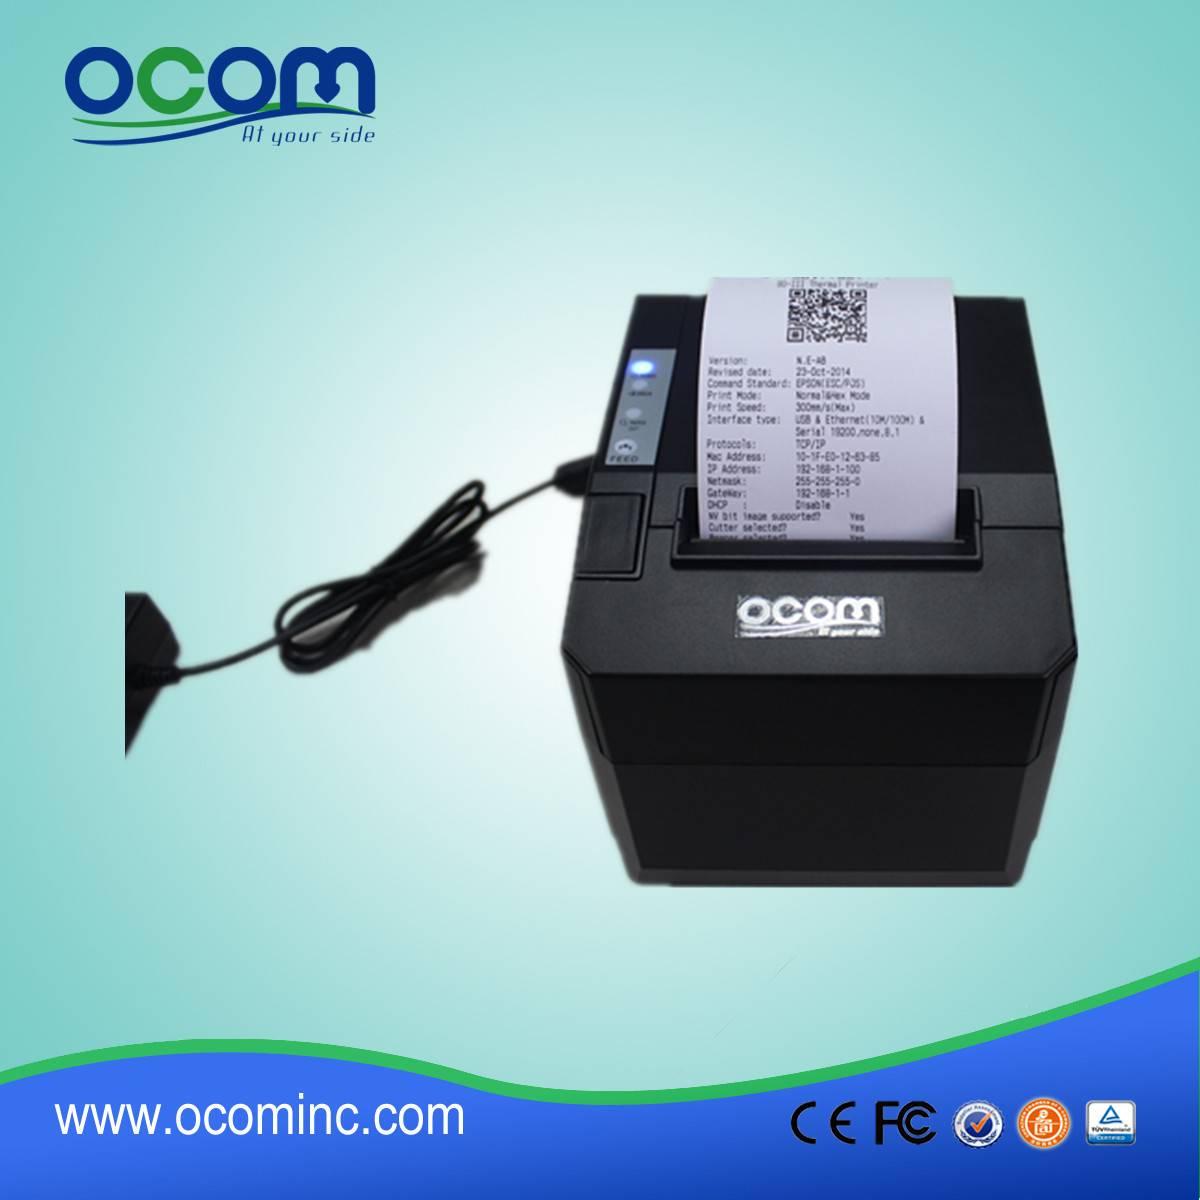 OCPP-88A: high quality 80 mm bluetooth thermal printer module